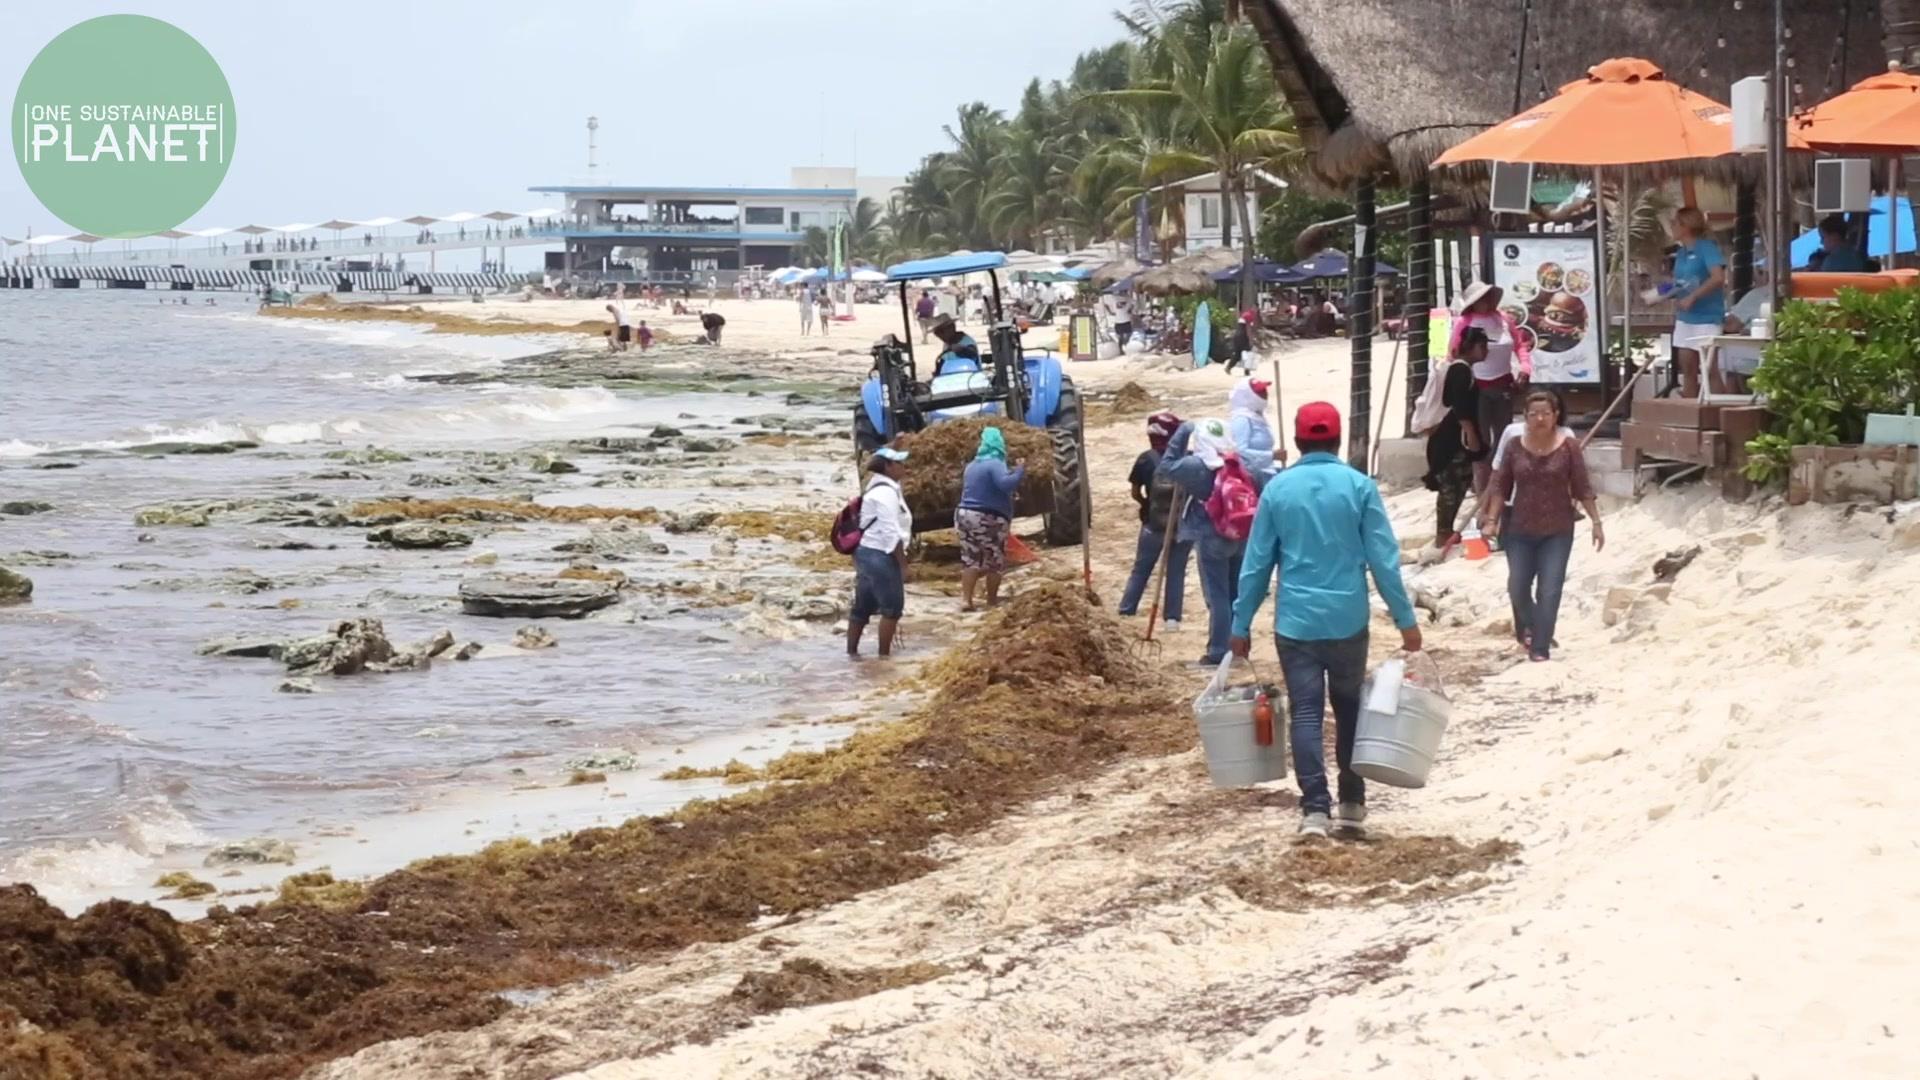 Sargassum Seaweed Invasion in the Caribbean